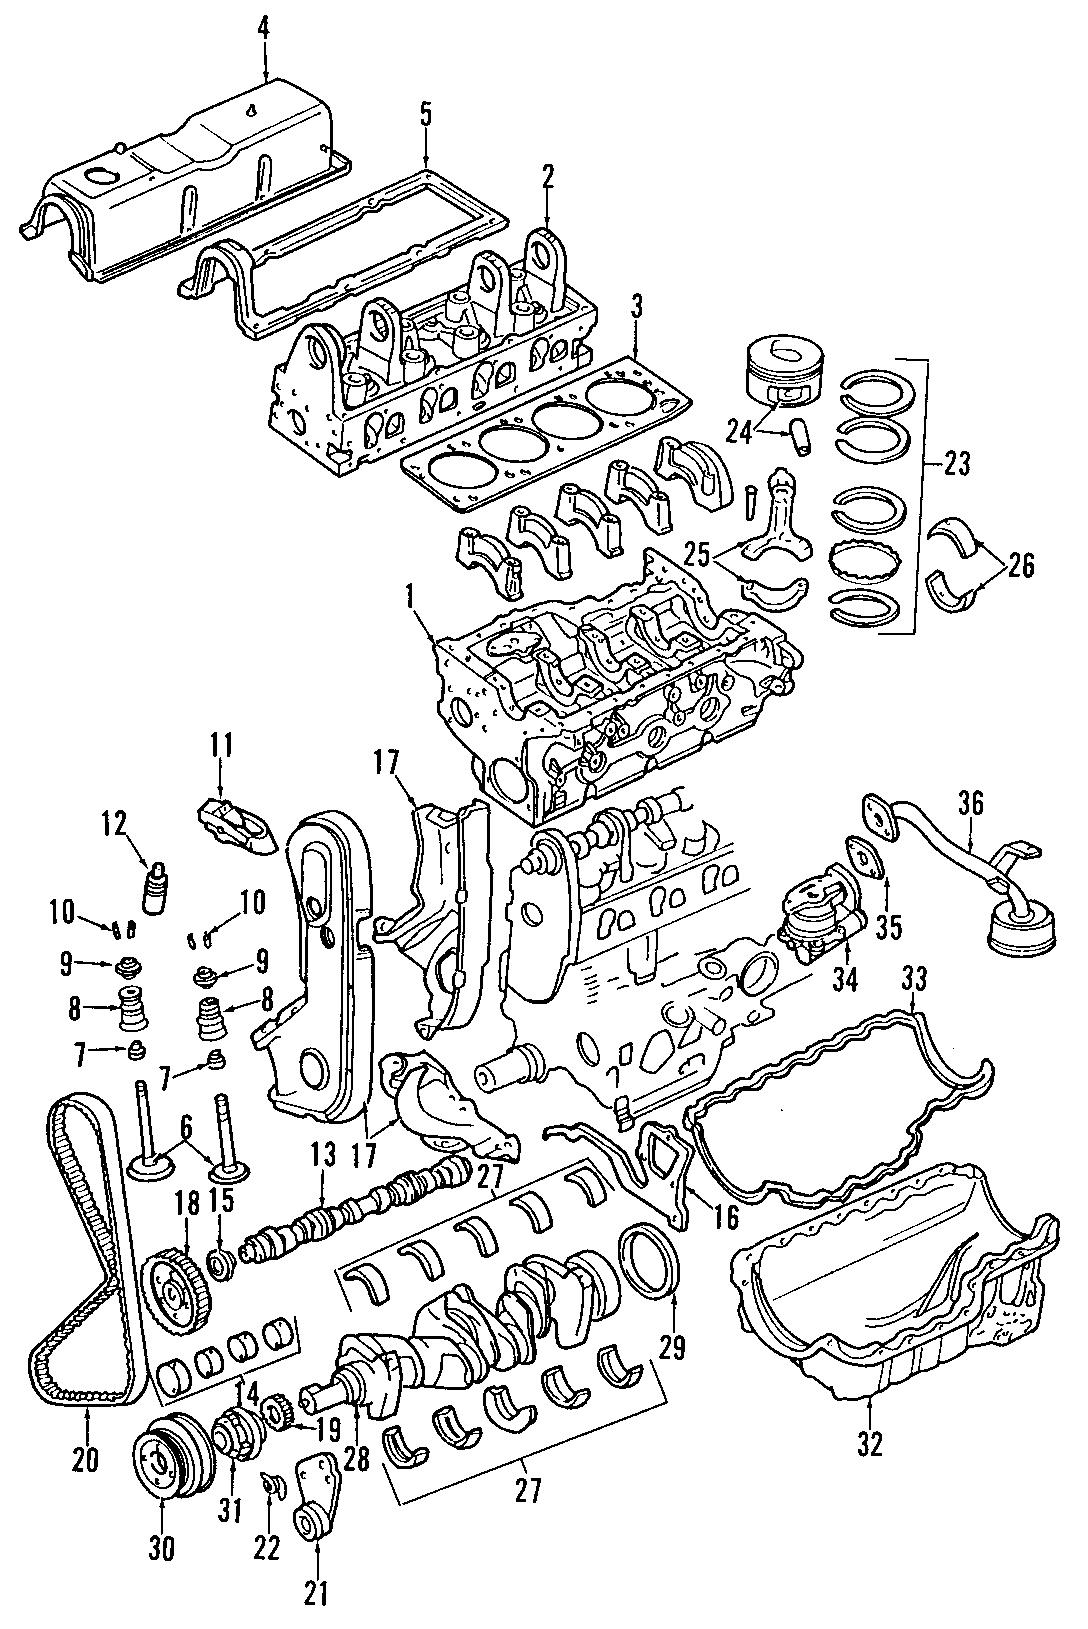 Zzm010602